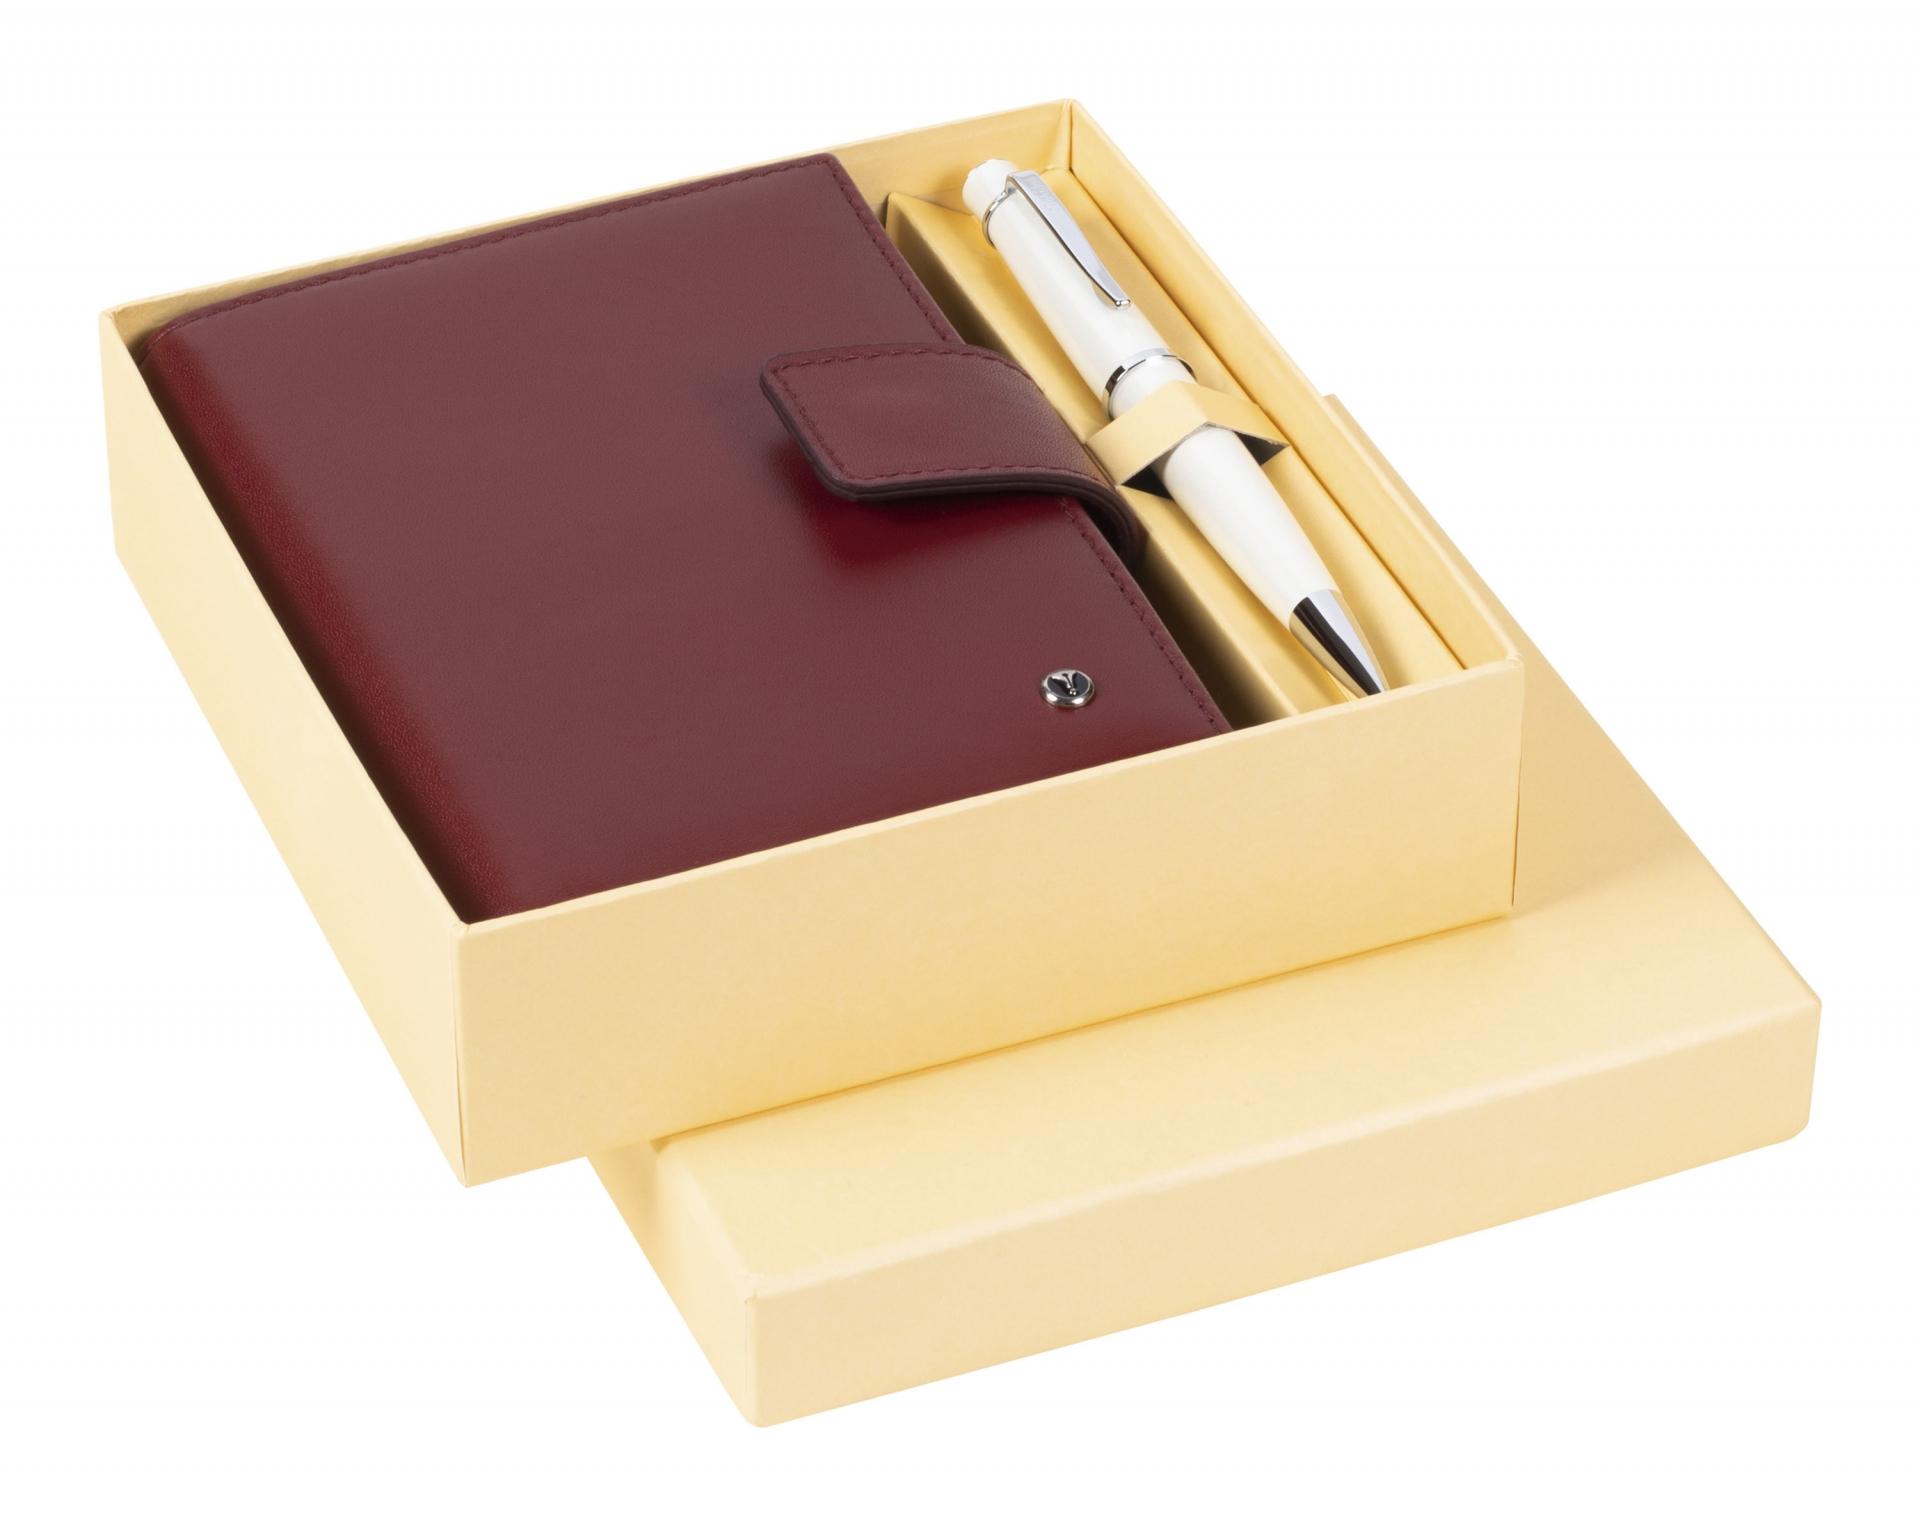 Подаръчен комплект химикалка 62 Chic White & Leather Pocket Organizer Claret Red  DR 3202-C3 / 2, модел 78416